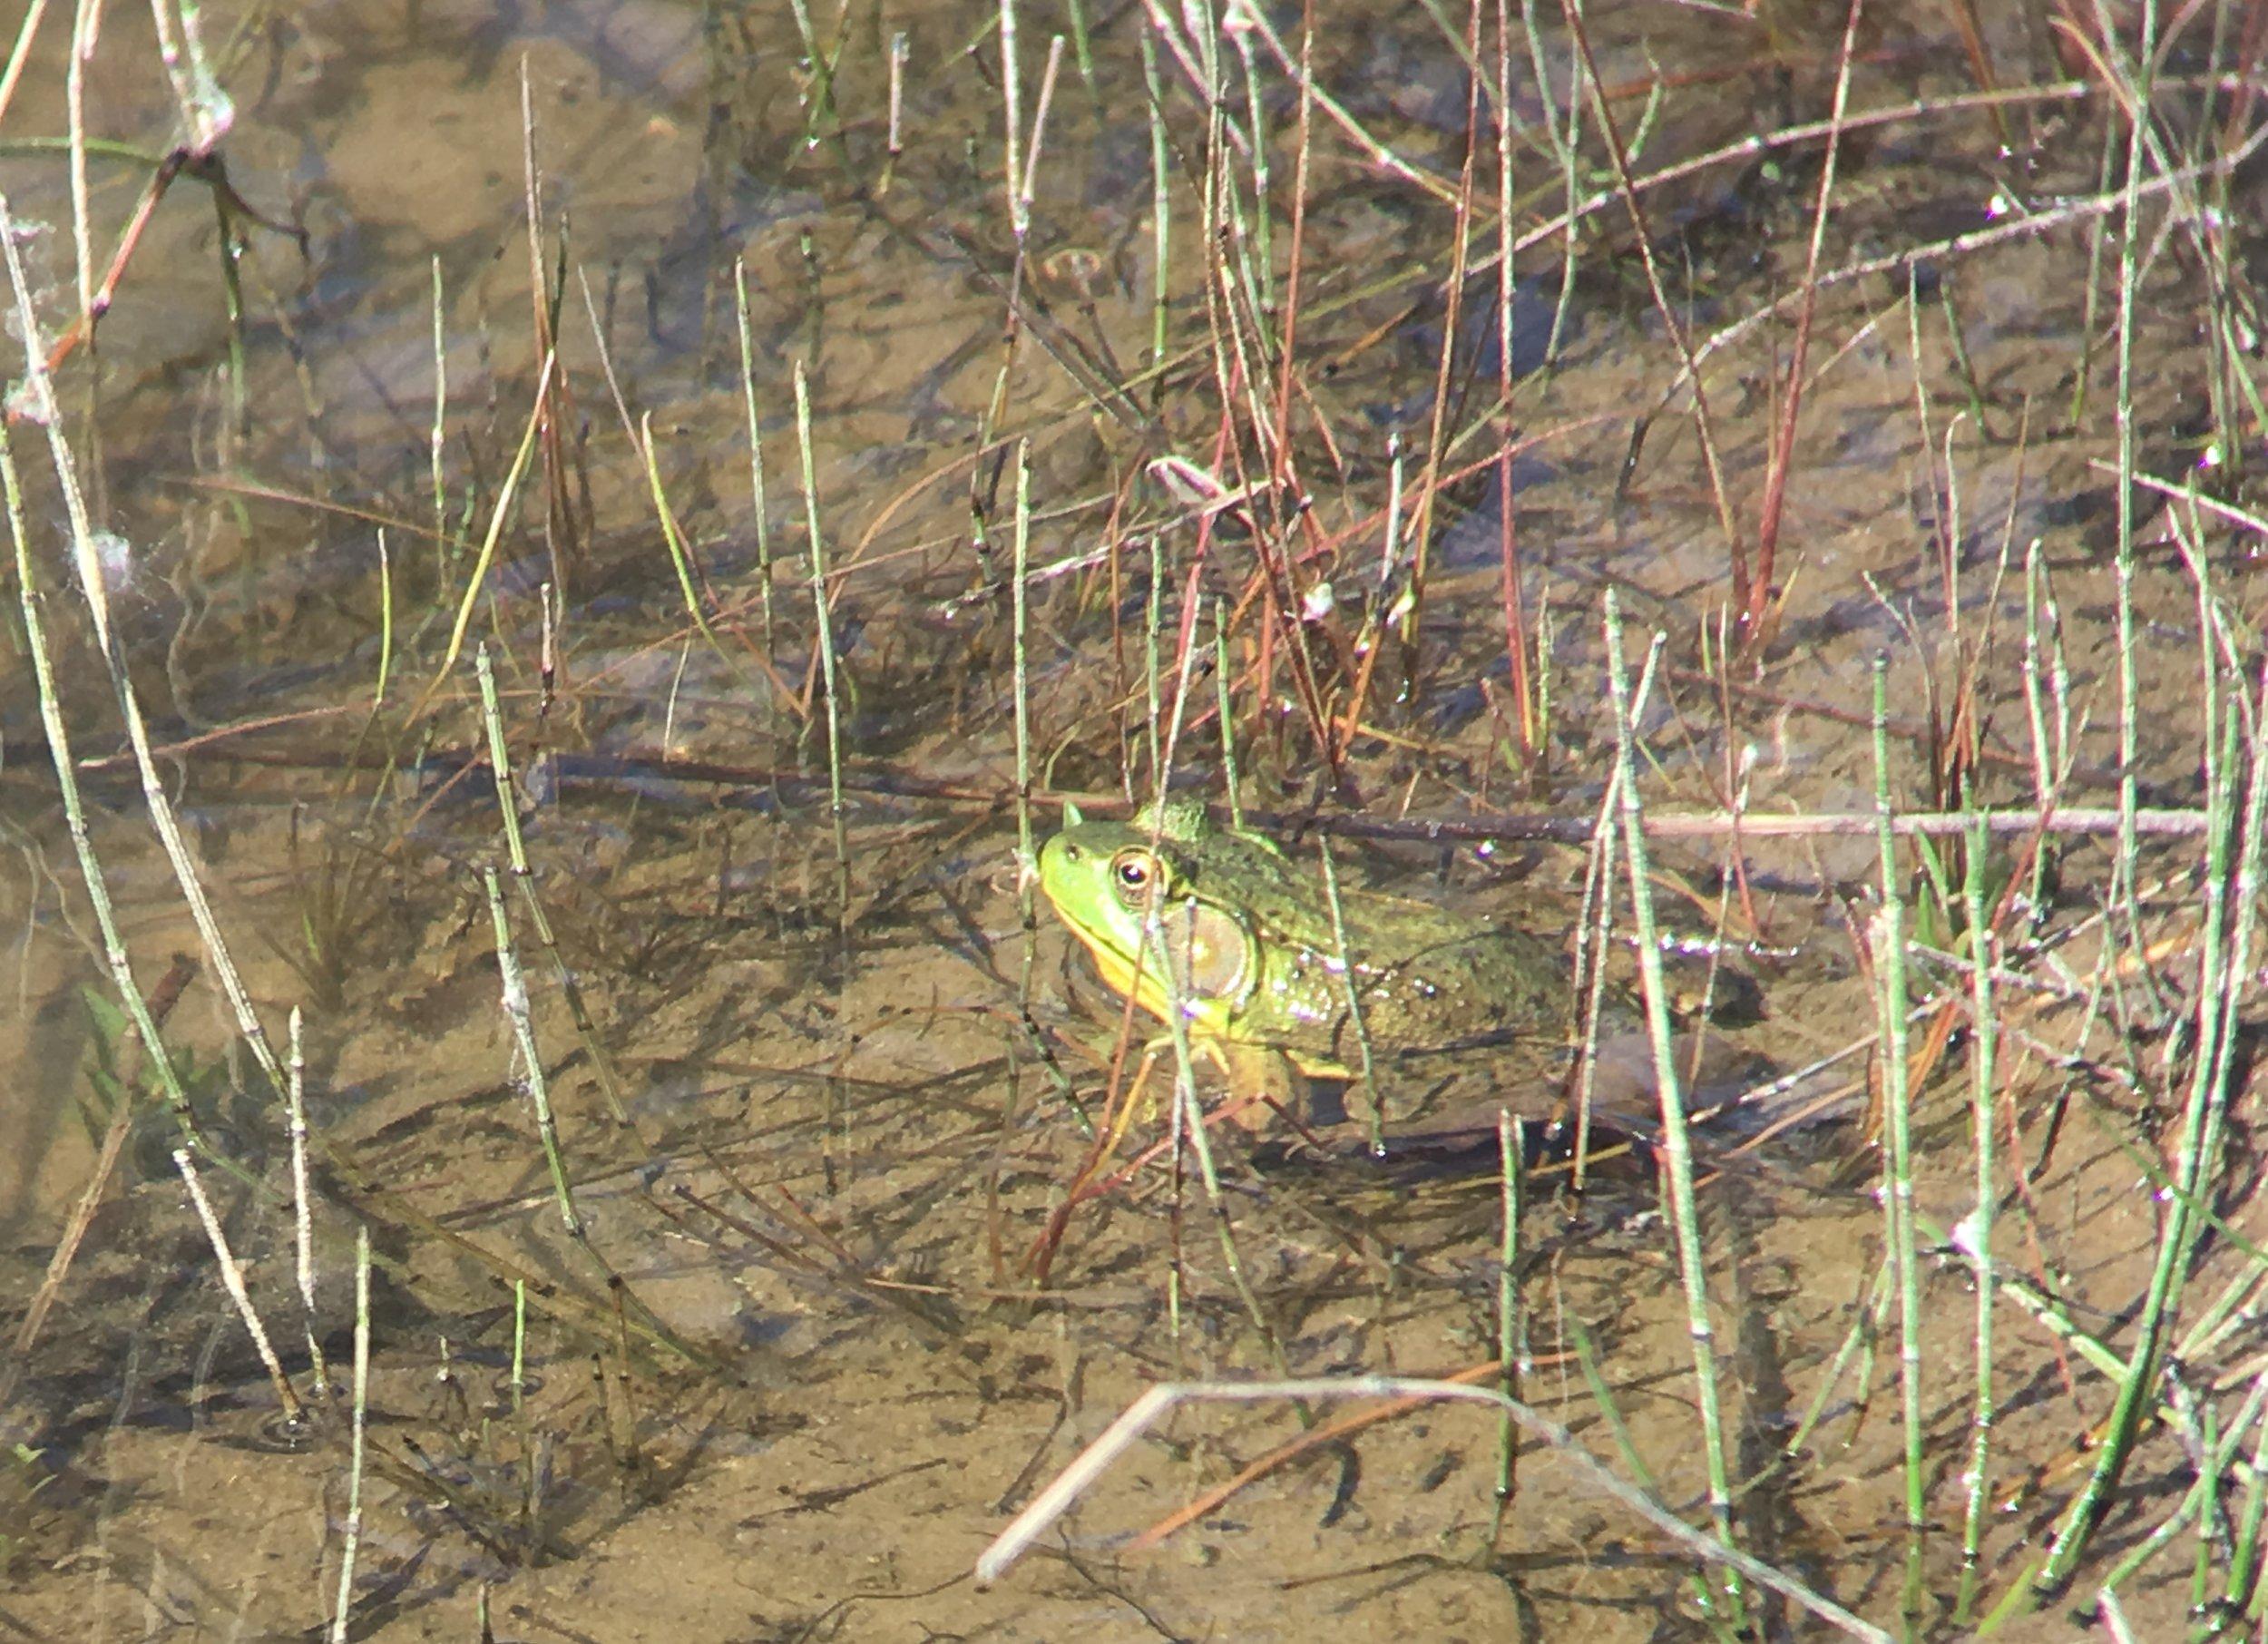 Green Frog - Heber Down Conservation Area - Jun 8/18